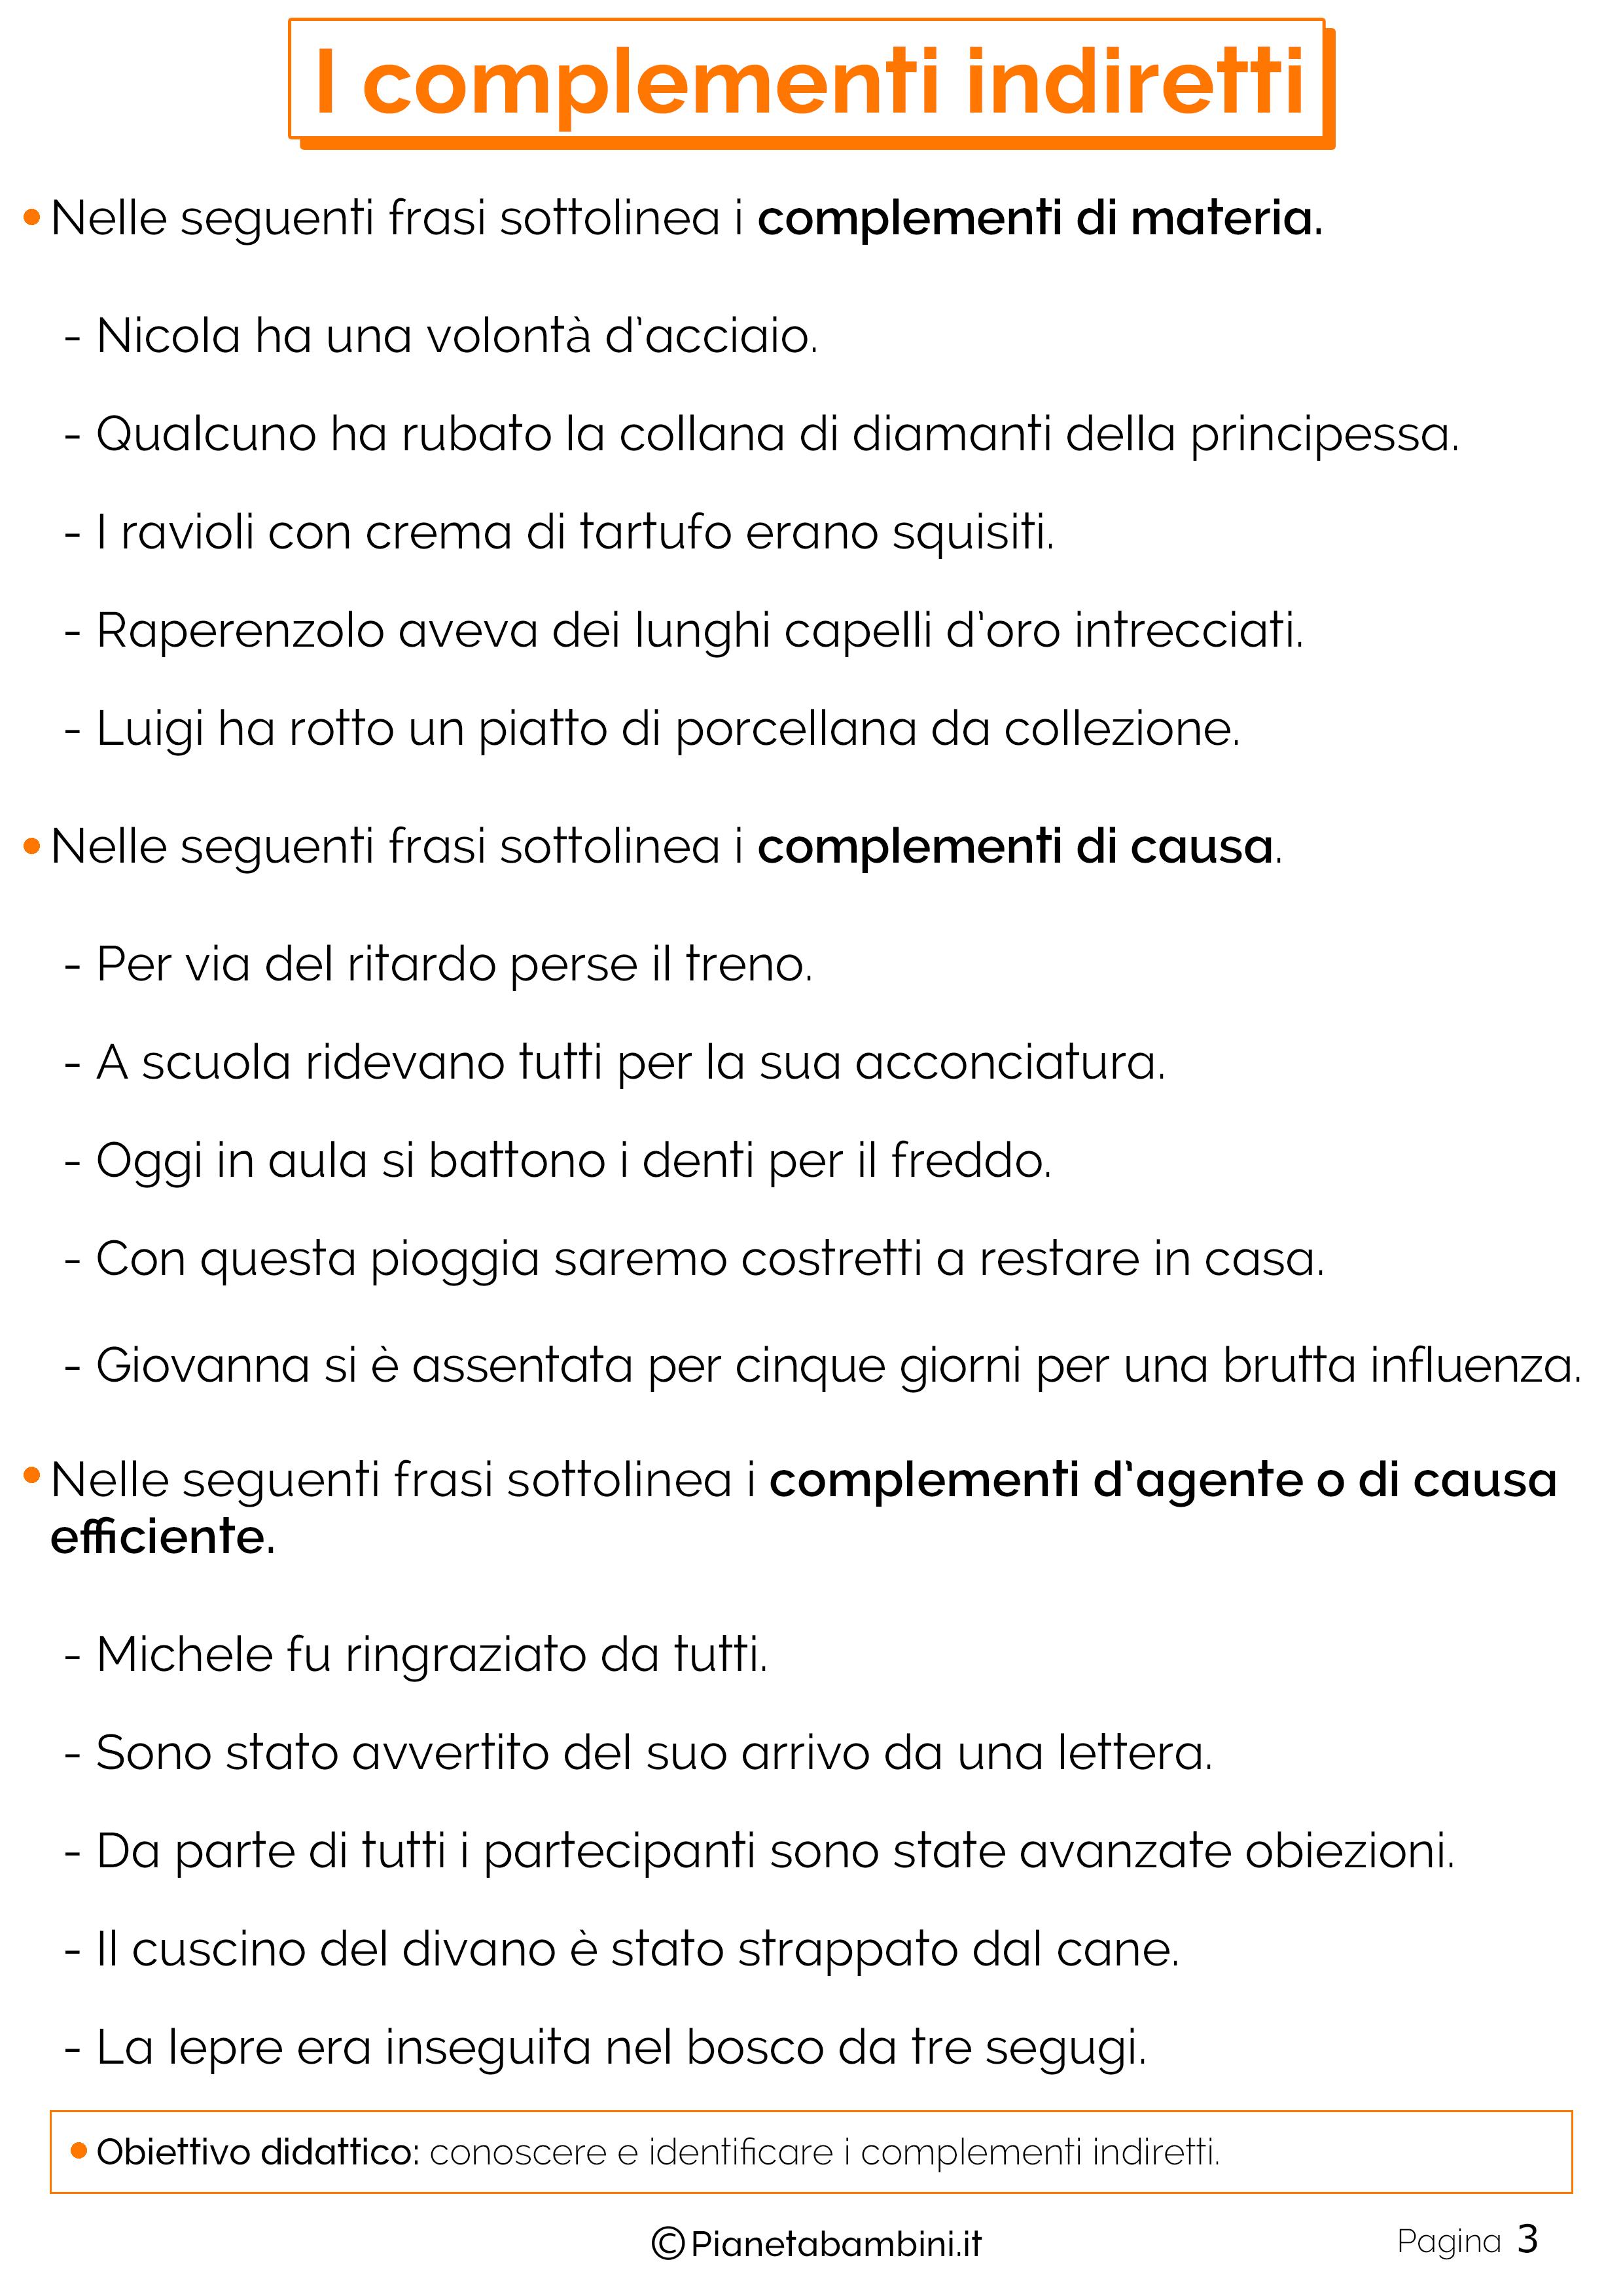 Esercizi sui complementi indiretti n.3